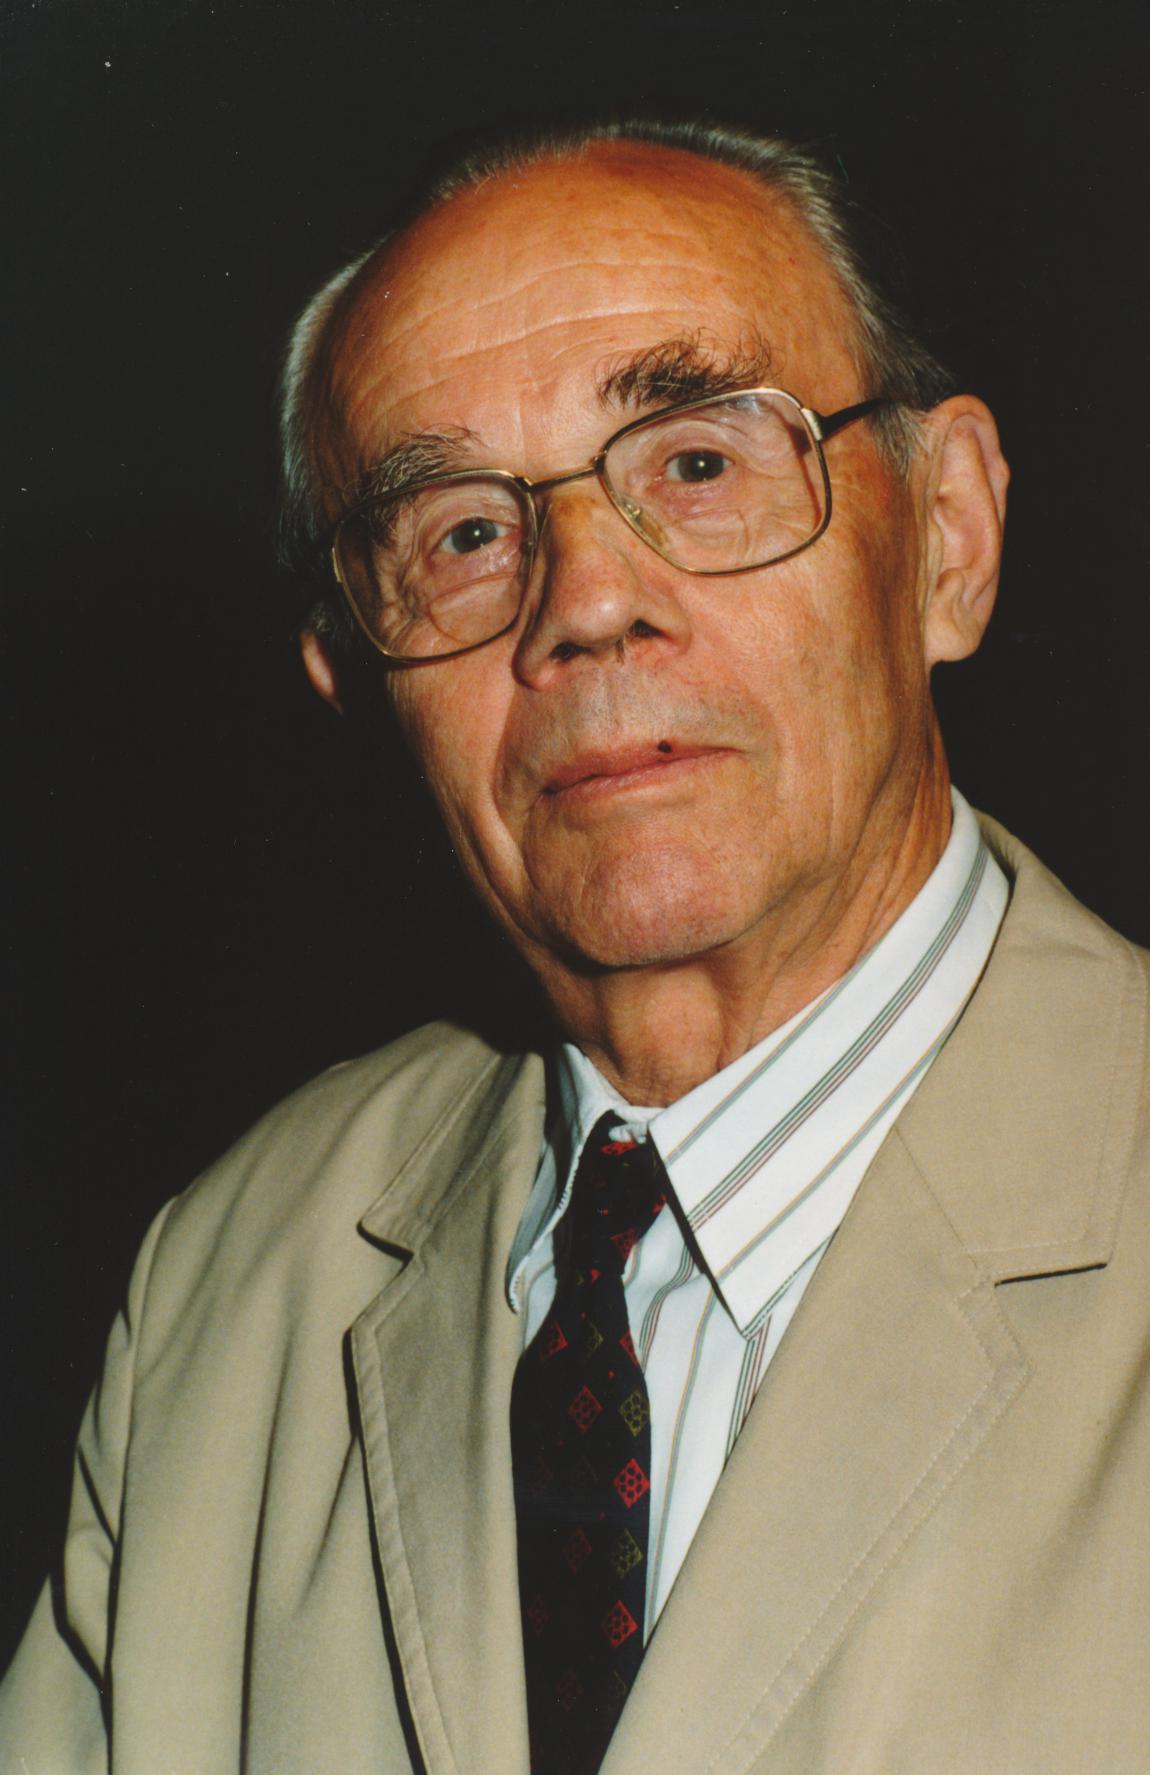 XII. Imago Mundi-Kongress 1989, Innsbruck, Prof. Dr. Erwin Nickel